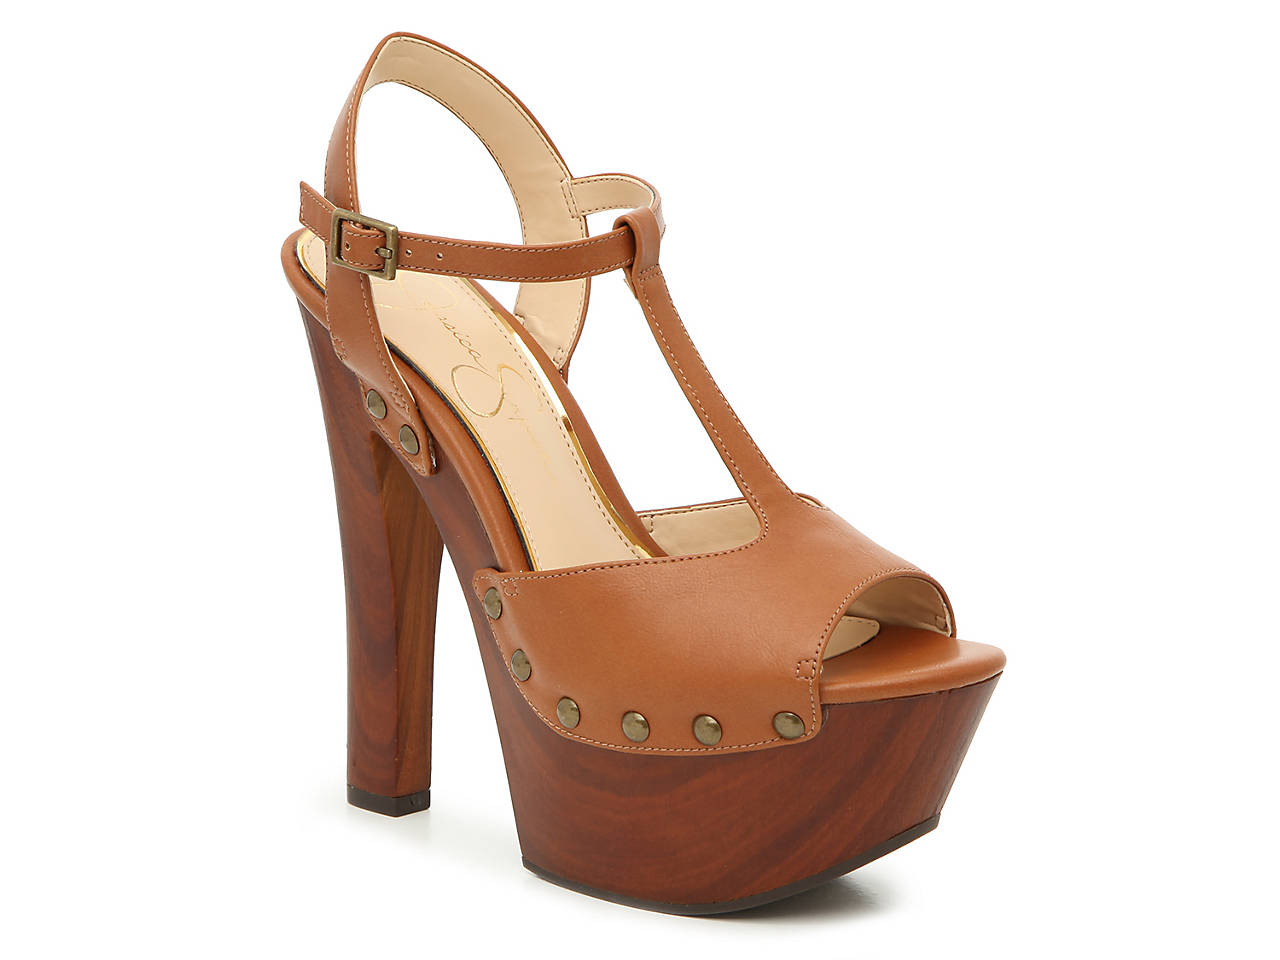 Desila Platform Sandal